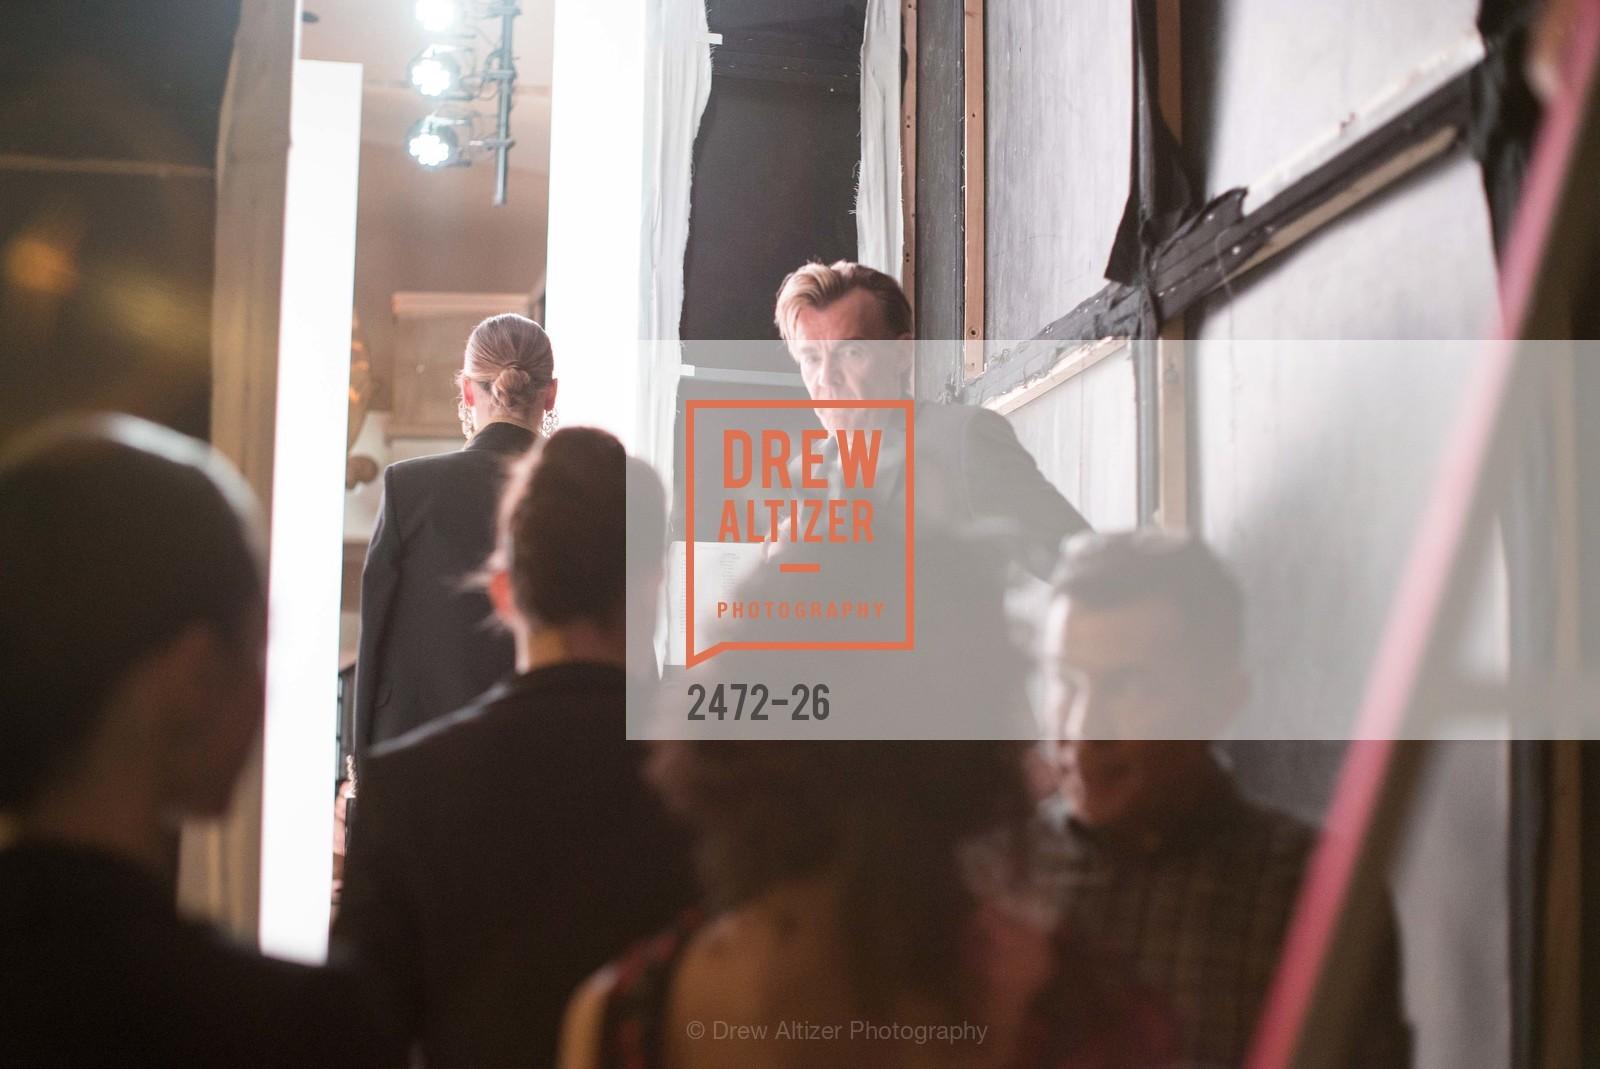 Fashion Show, Neiman Marcus Presents the 2015 San Francisco Ballet Fashion Show, April 2nd, 2015, Photo,Drew Altizer, Drew Altizer Photography, full-service event agency, private events, San Francisco photographer, photographer California